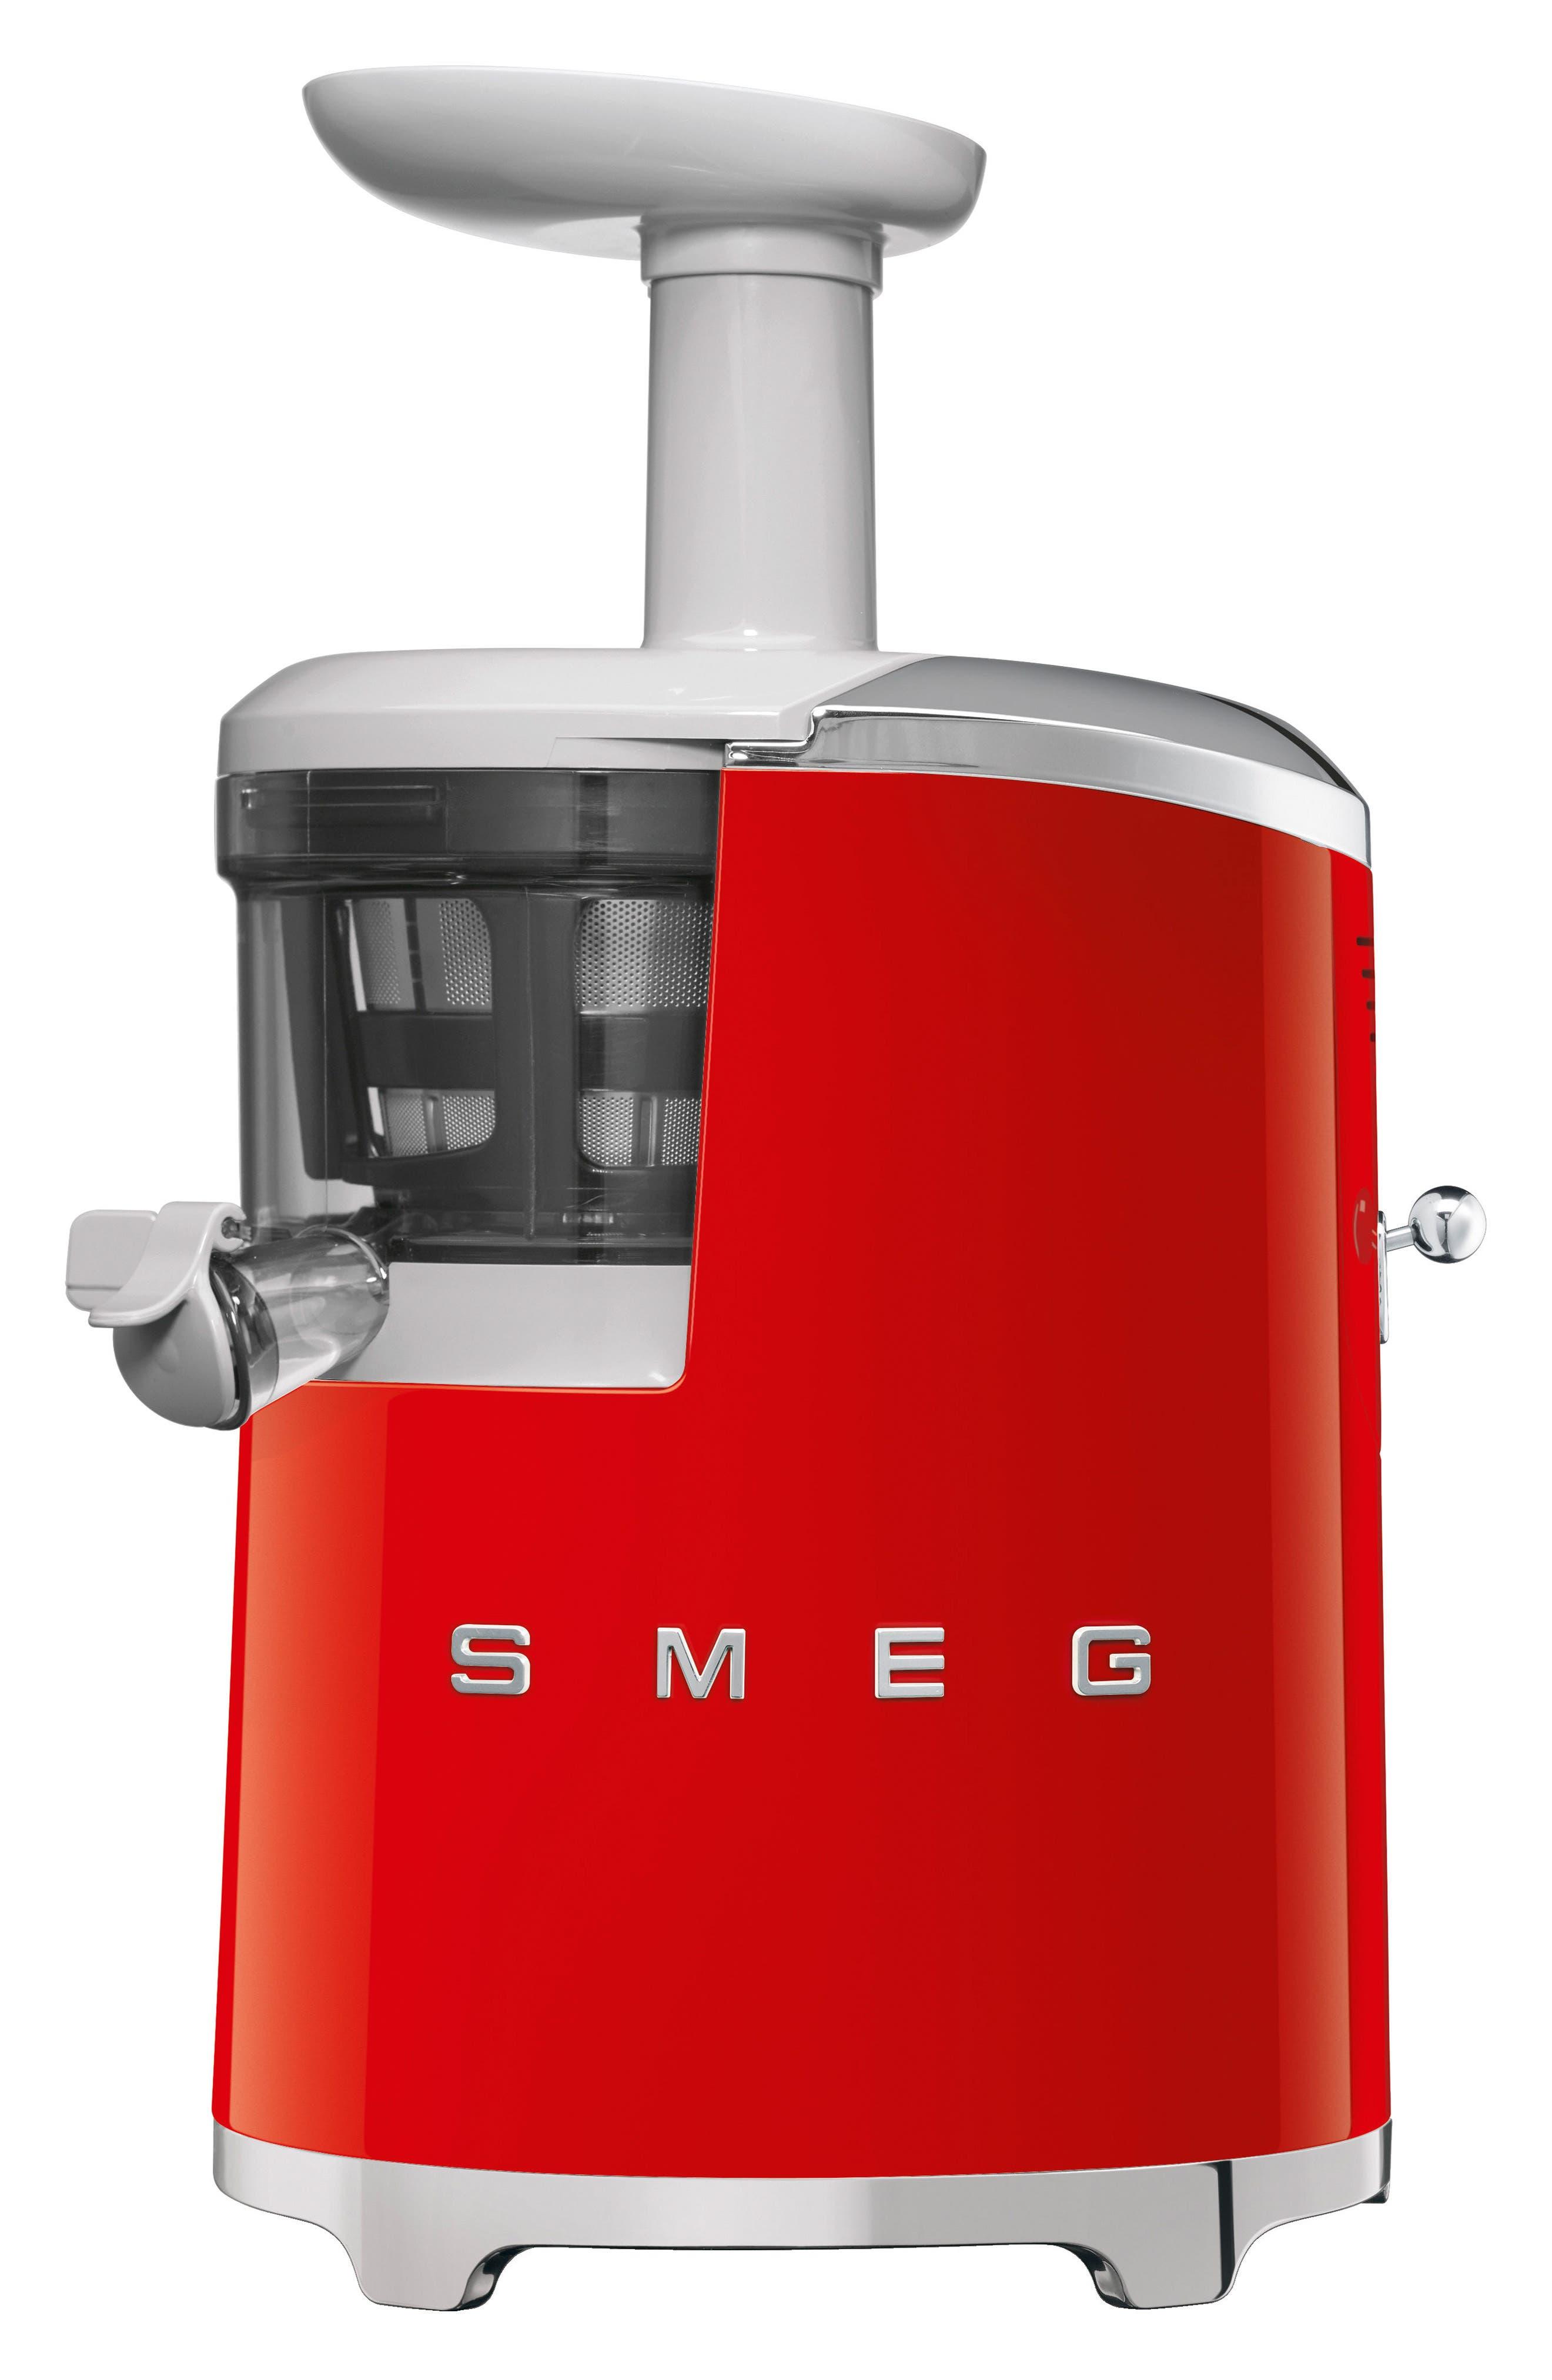 smeg 50s Retro Style Slow Juicer